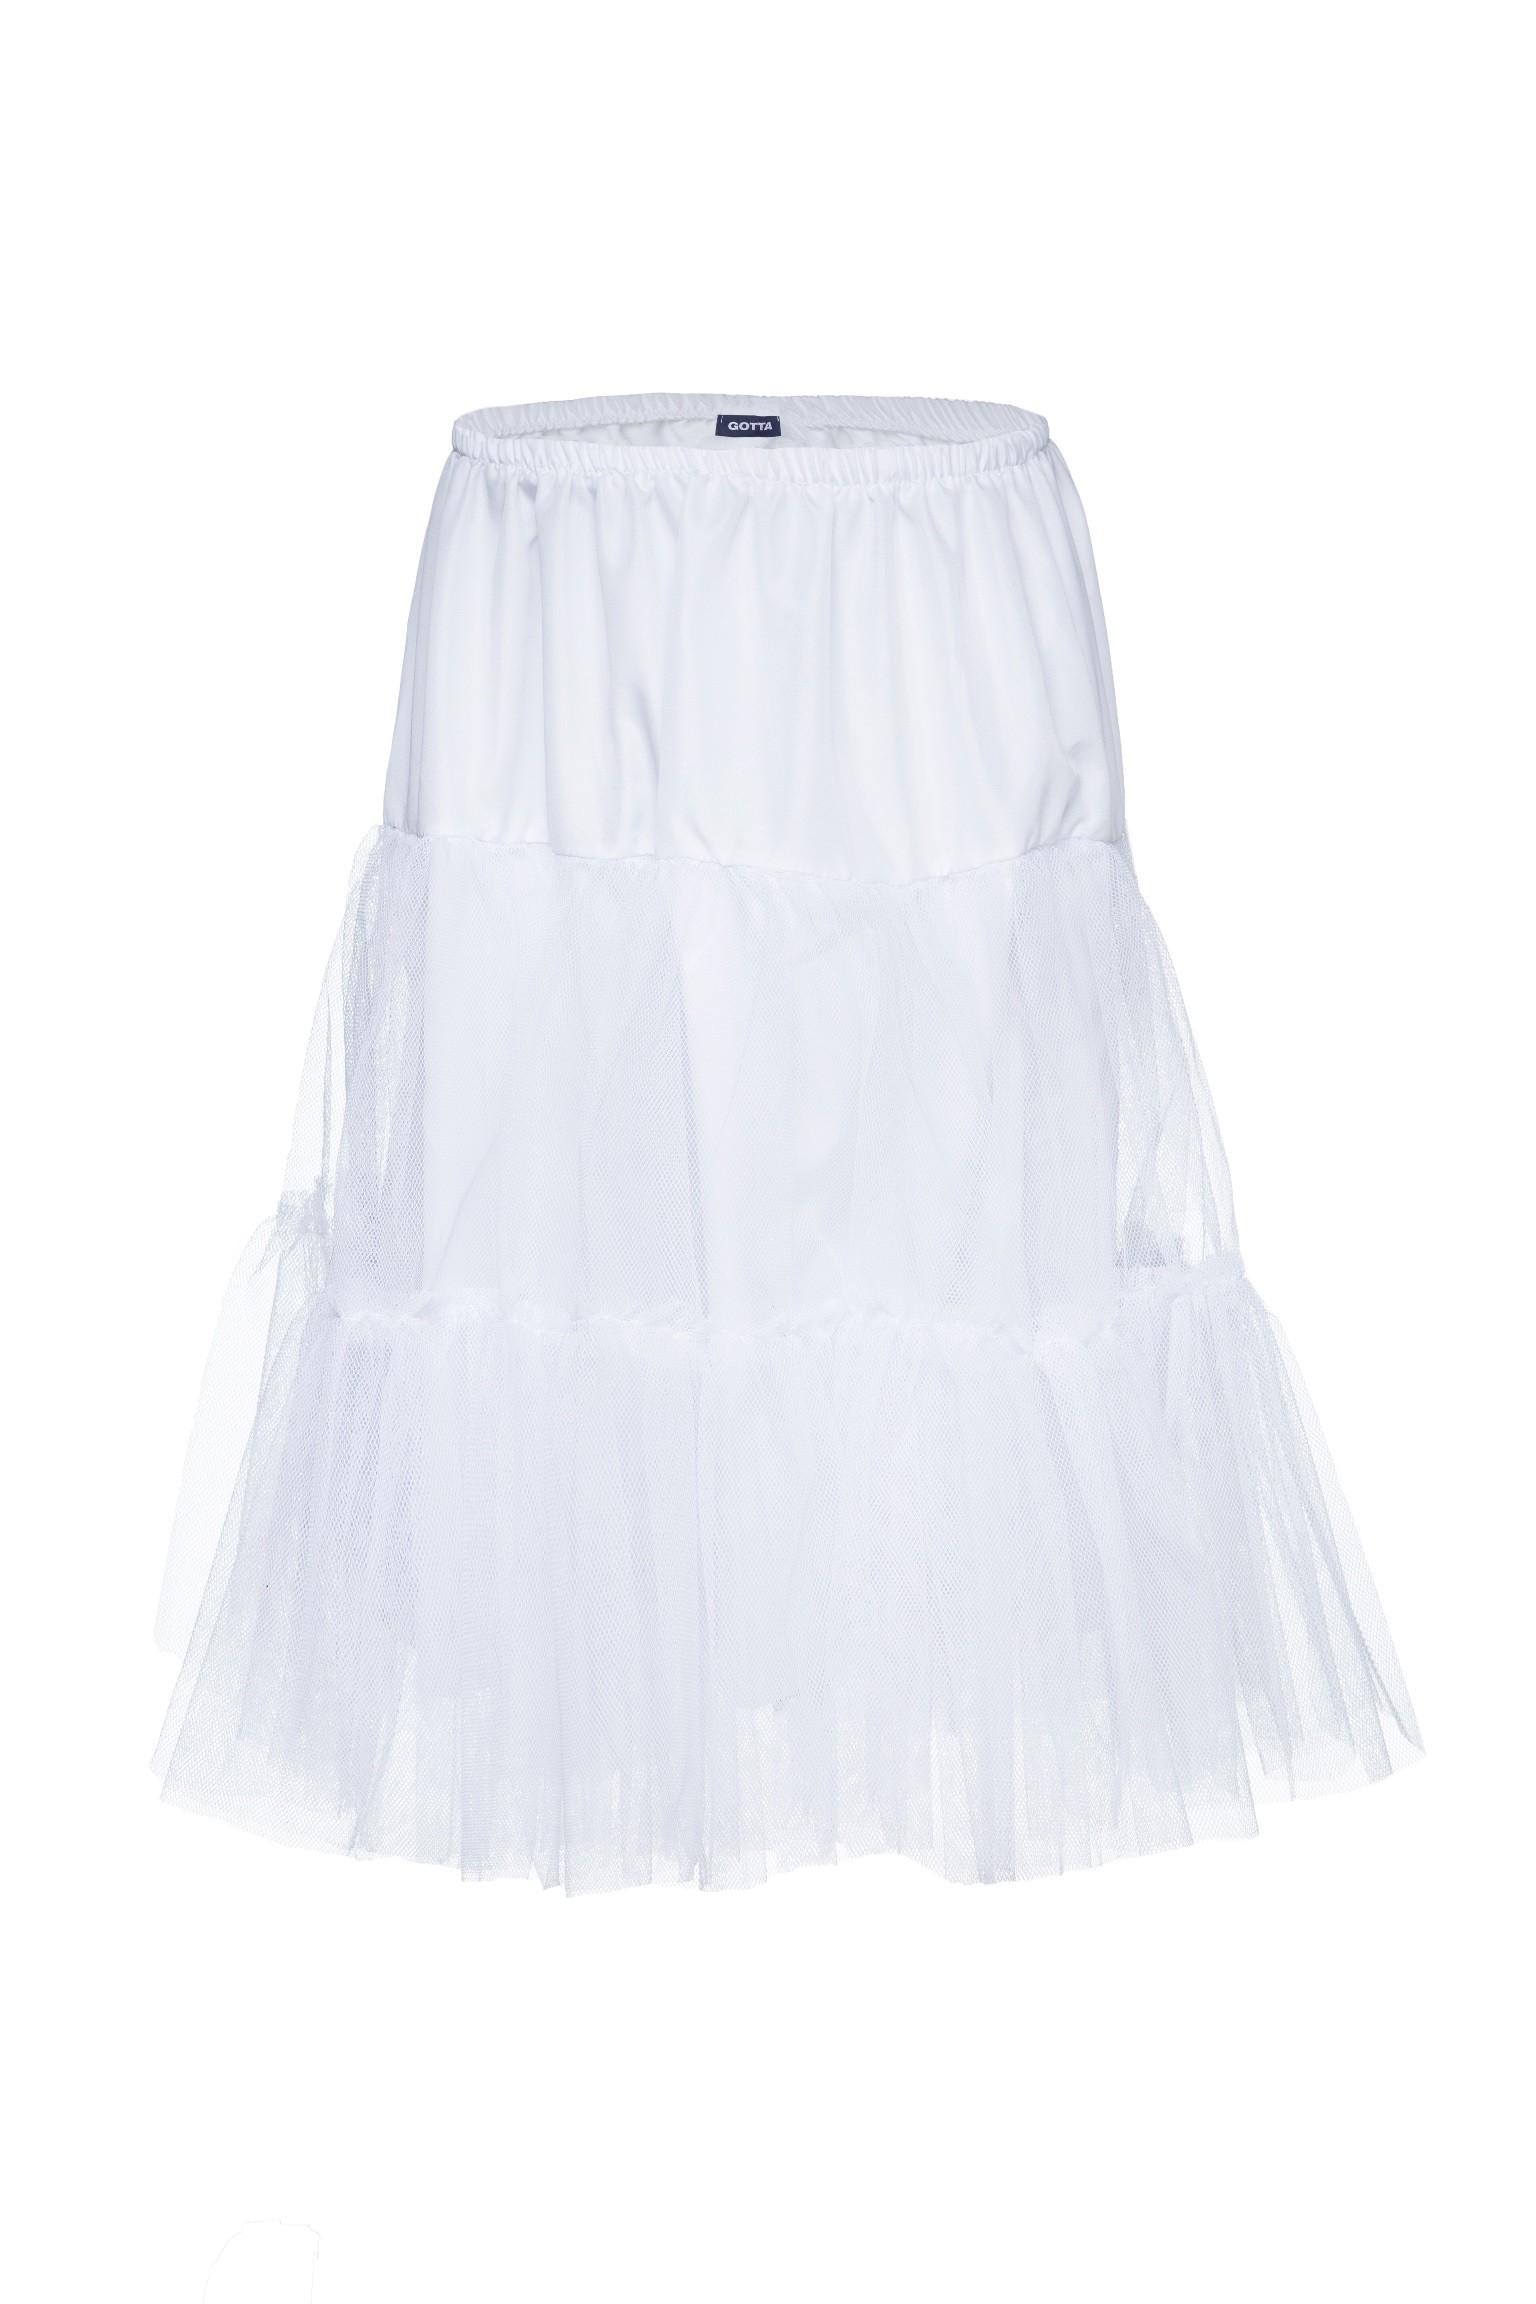 a29b6b725ac Spodnička GOTTA bílá - Alltex-fashion.cz